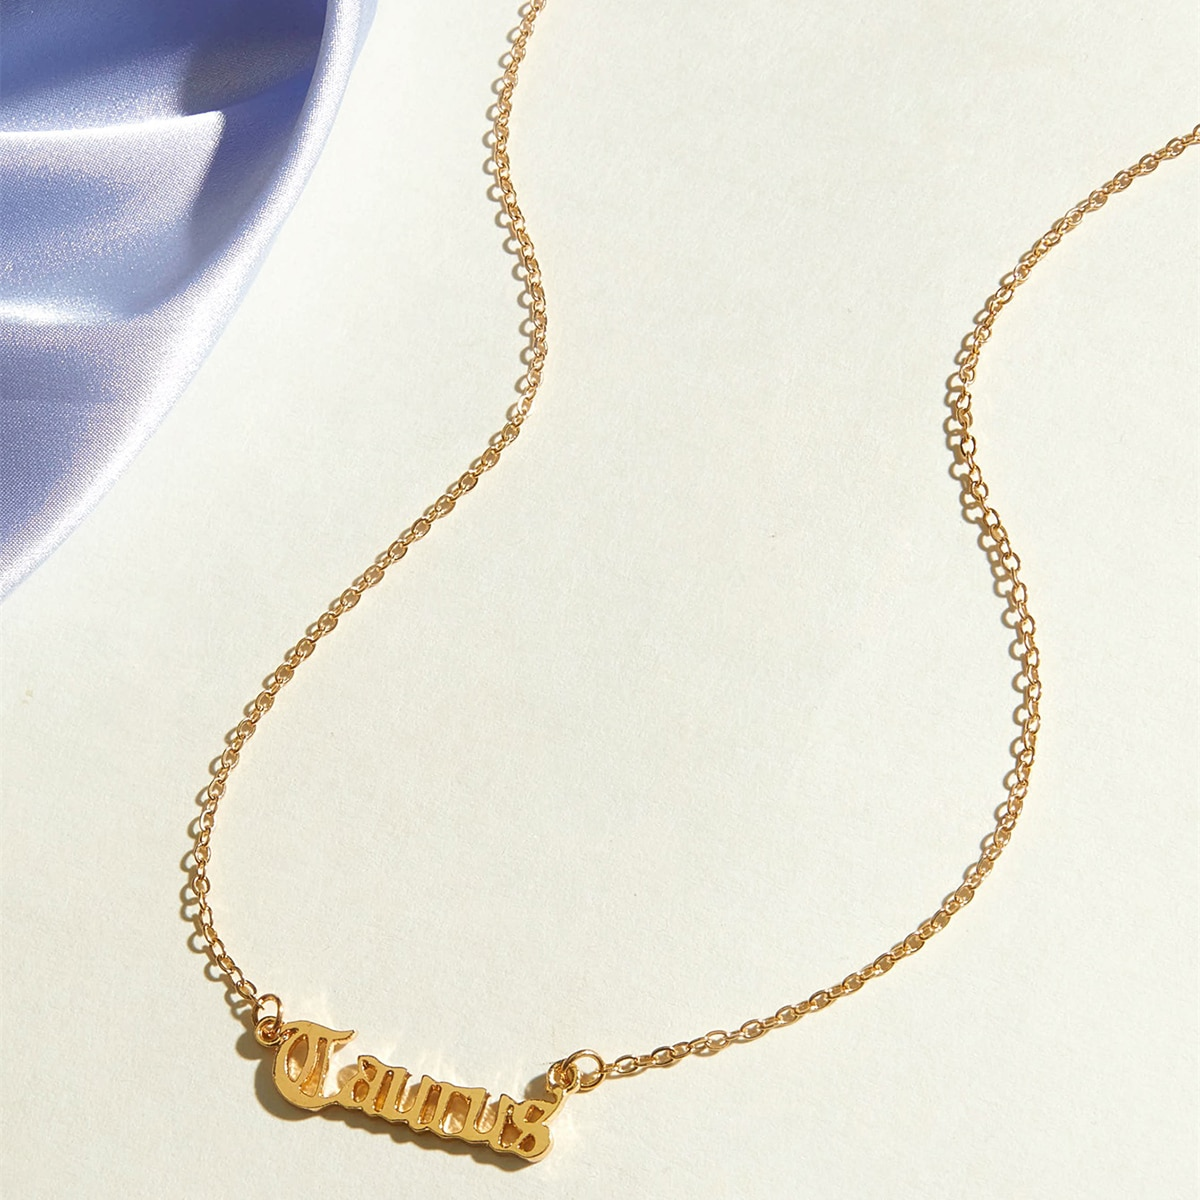 1pc Taurus Charm Halskette